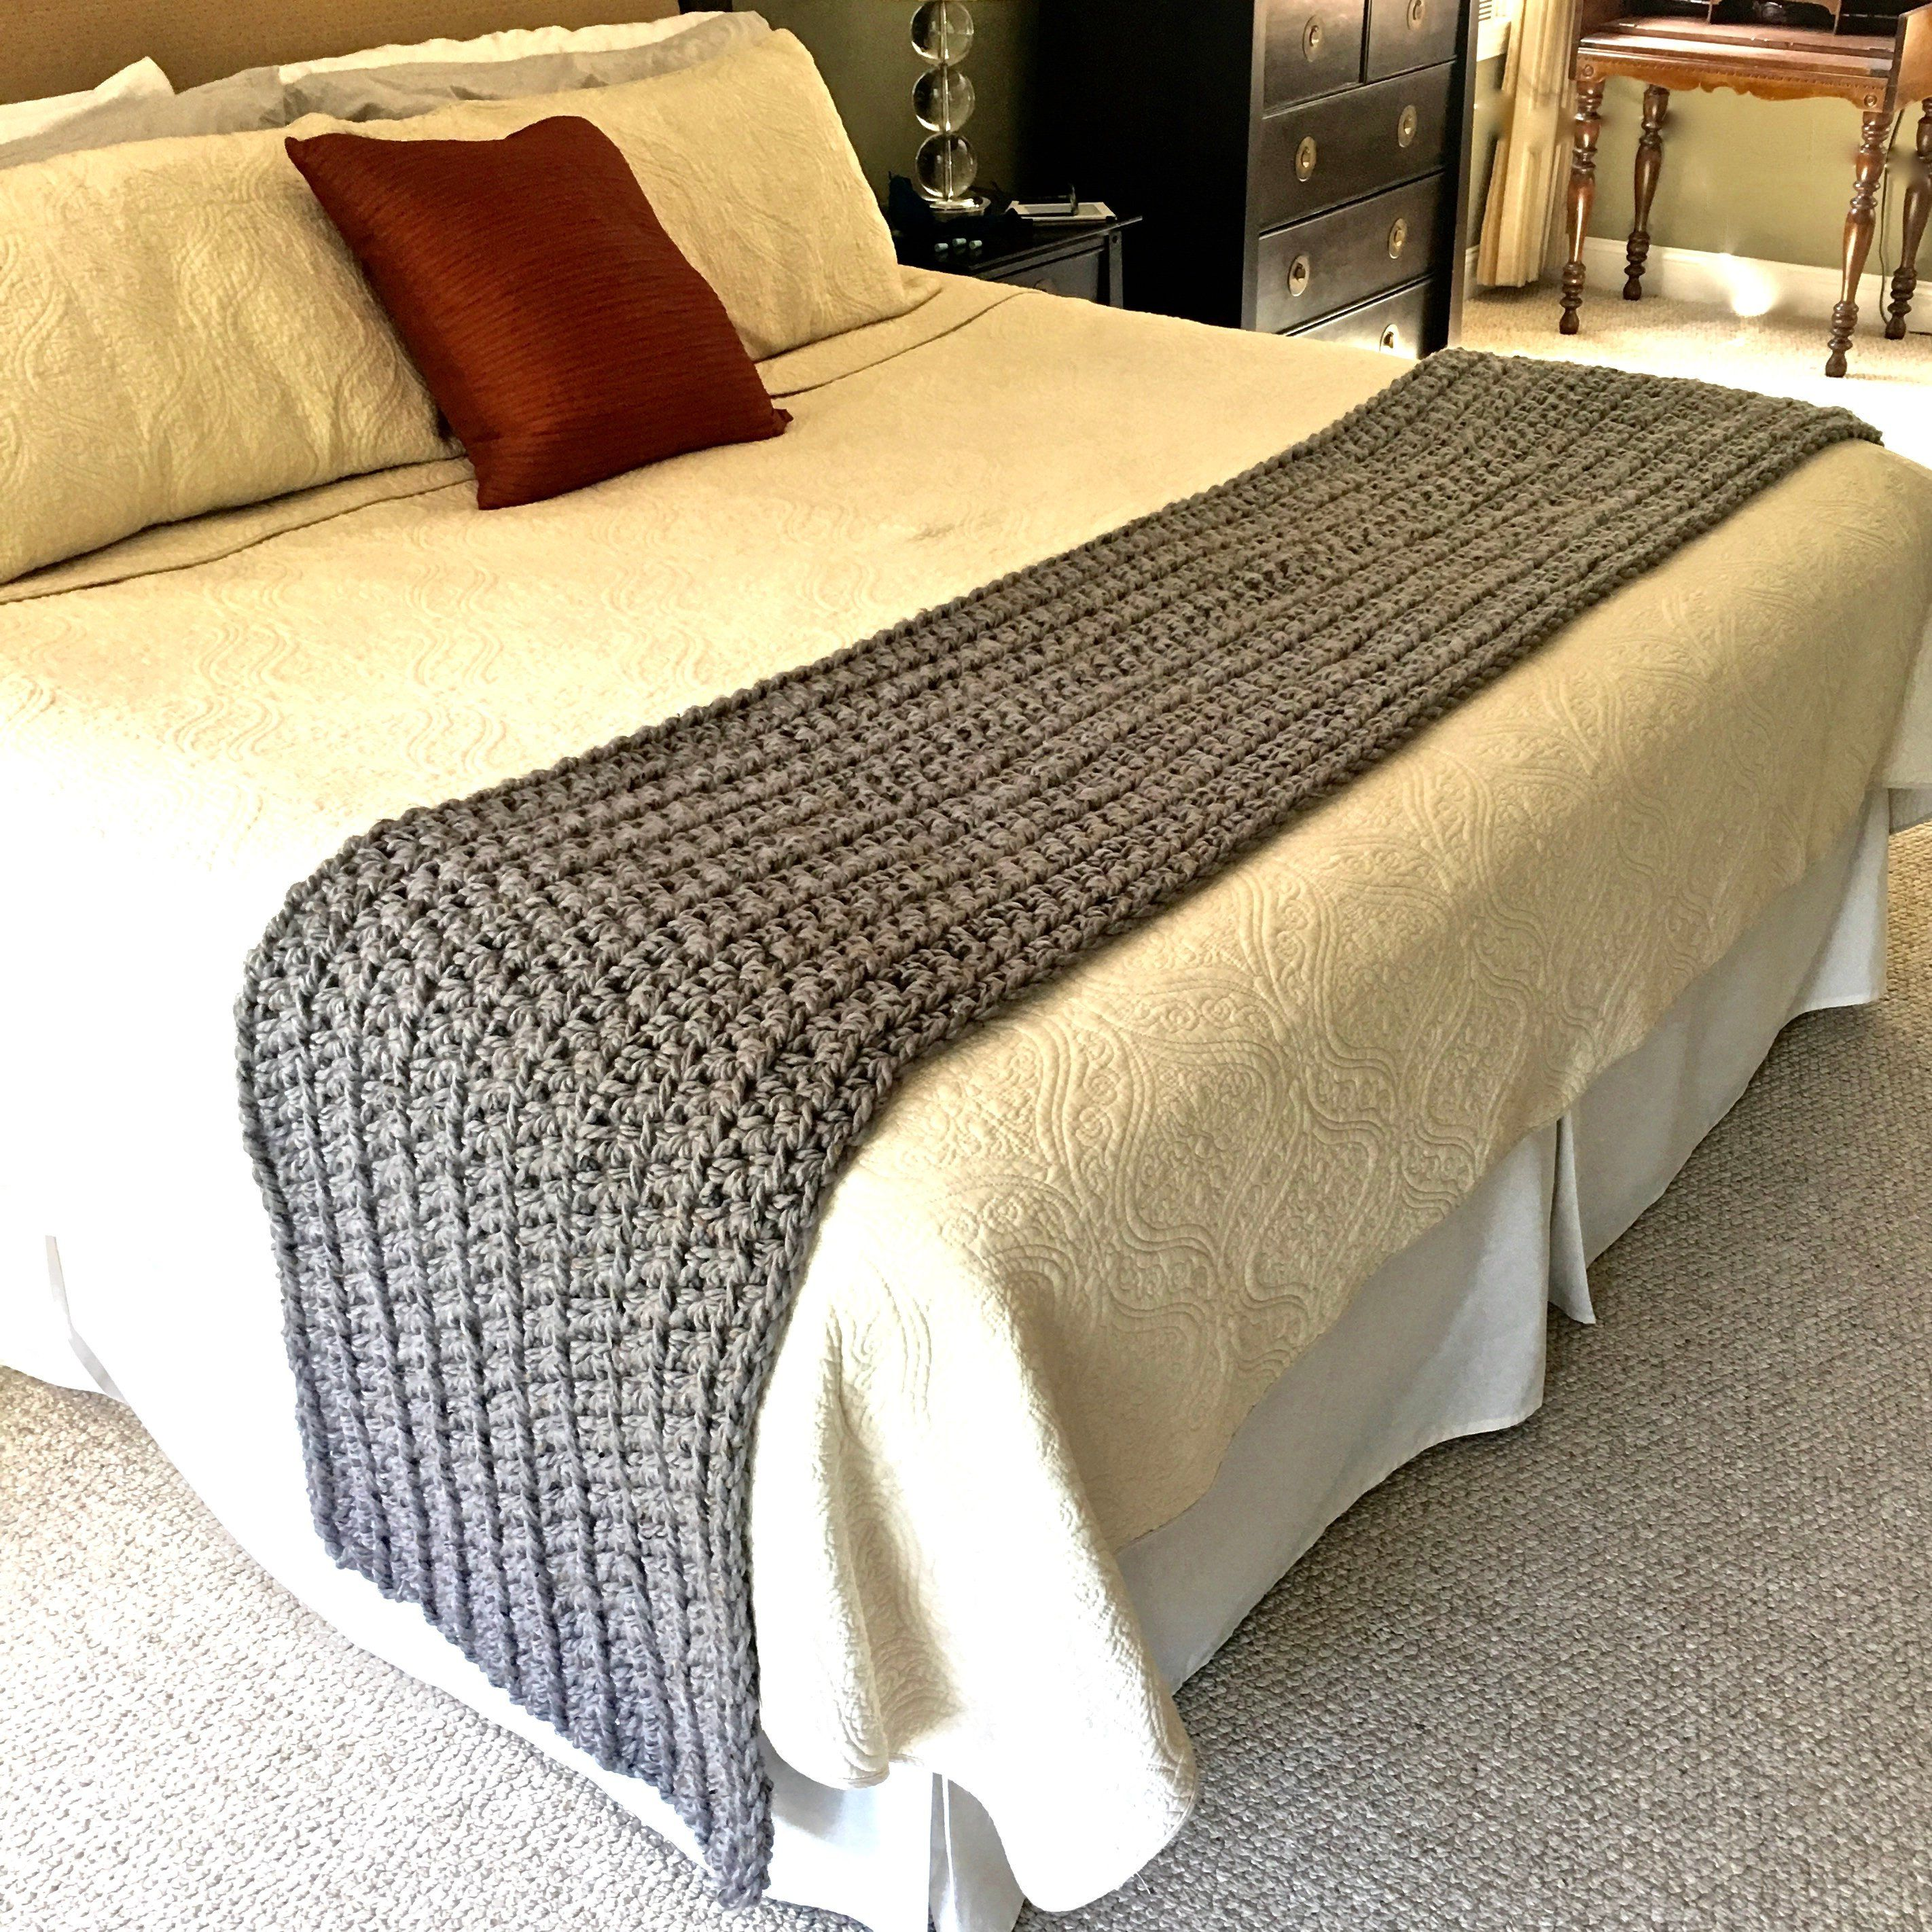 King Size Bed Runner Chunky Knit Blanket Grey Crochet Runner By Pokayoka On Etsy Crochet Blanket Grey Bed Runner Knitted Blankets